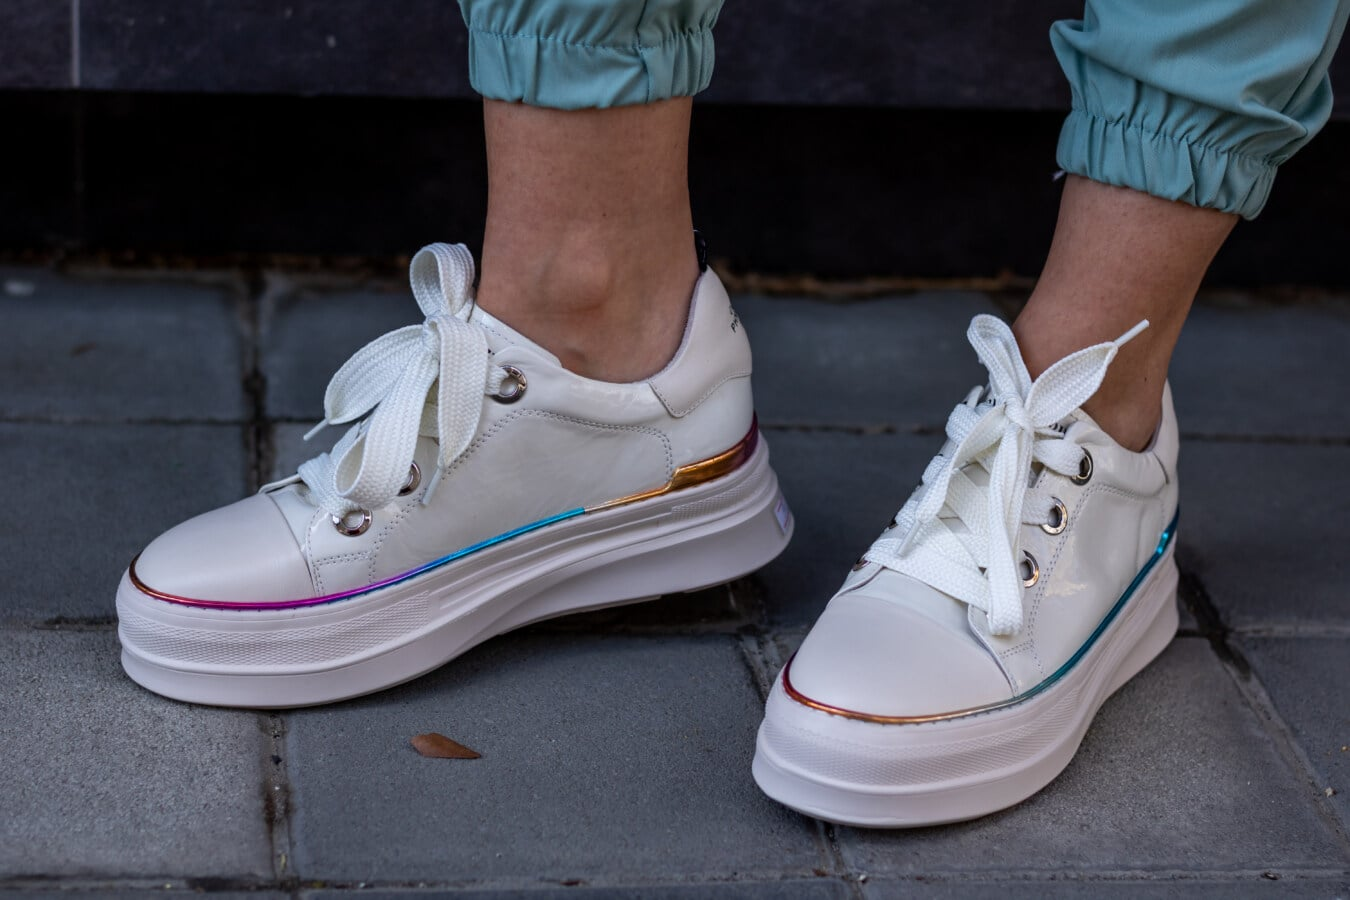 fantaisie, blanc, style, chaussures de sport, trendy, peau, pieds nus, jambes, lacet, chaussures